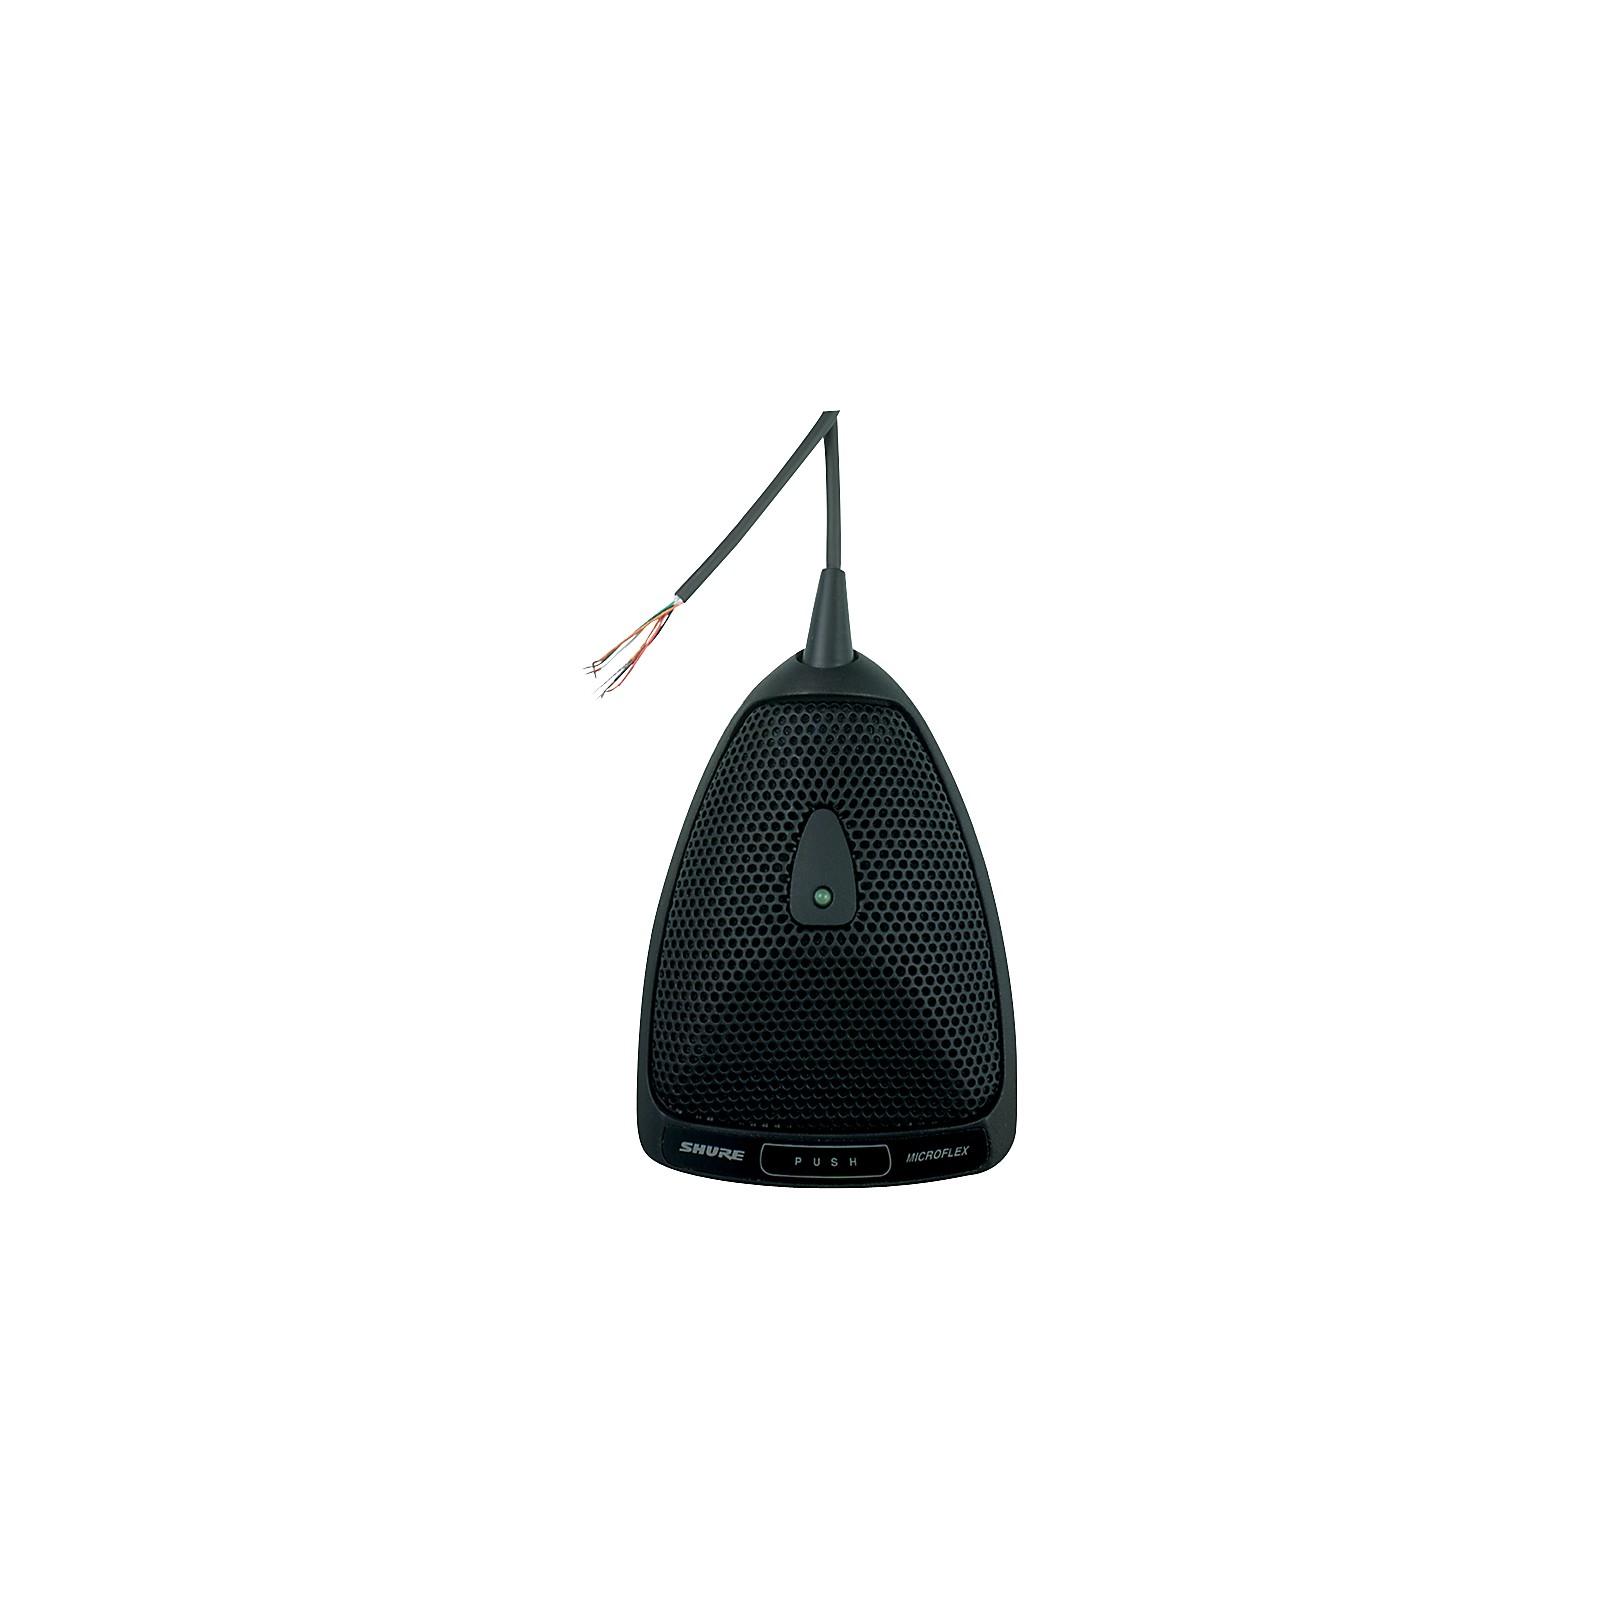 Open Box Shure MX392/S Microflex Boundary Microphone